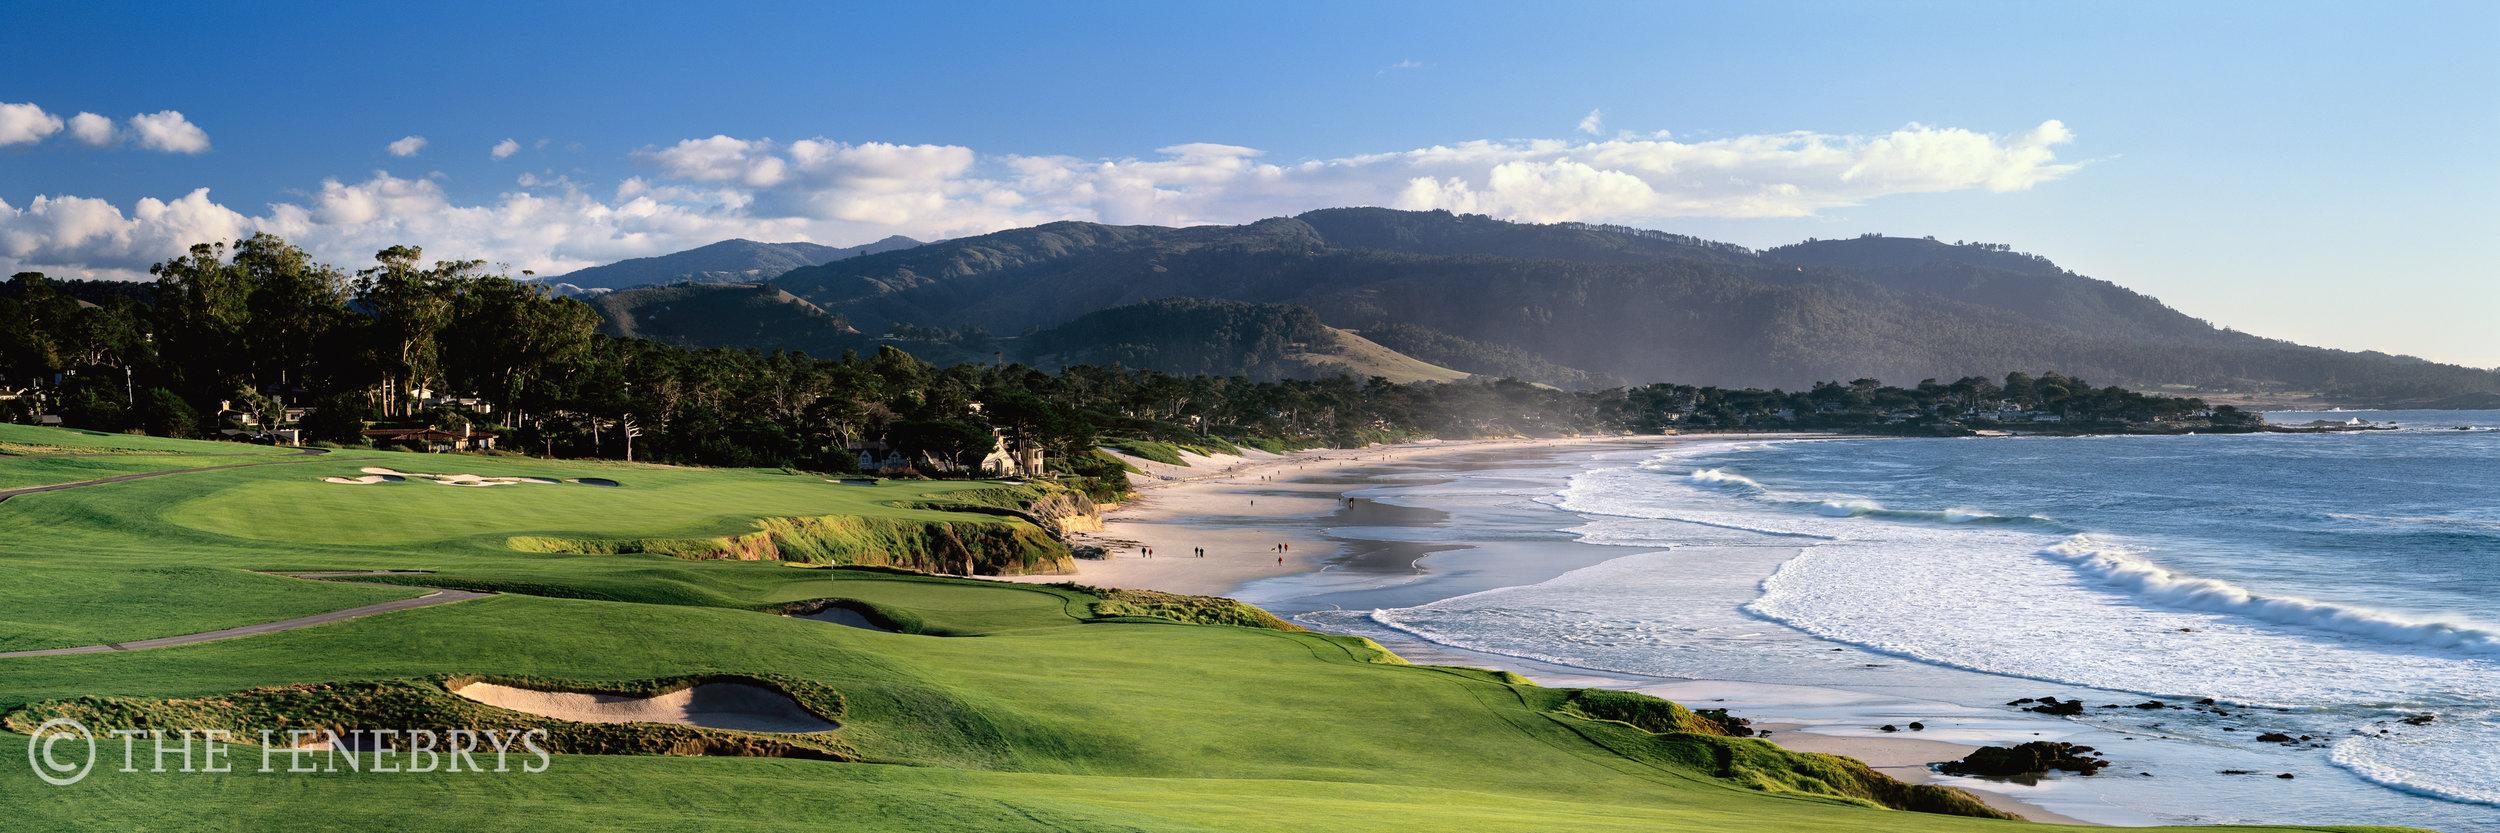 """By The Sea"" 9th Pebble Beach Golf Links®, California"